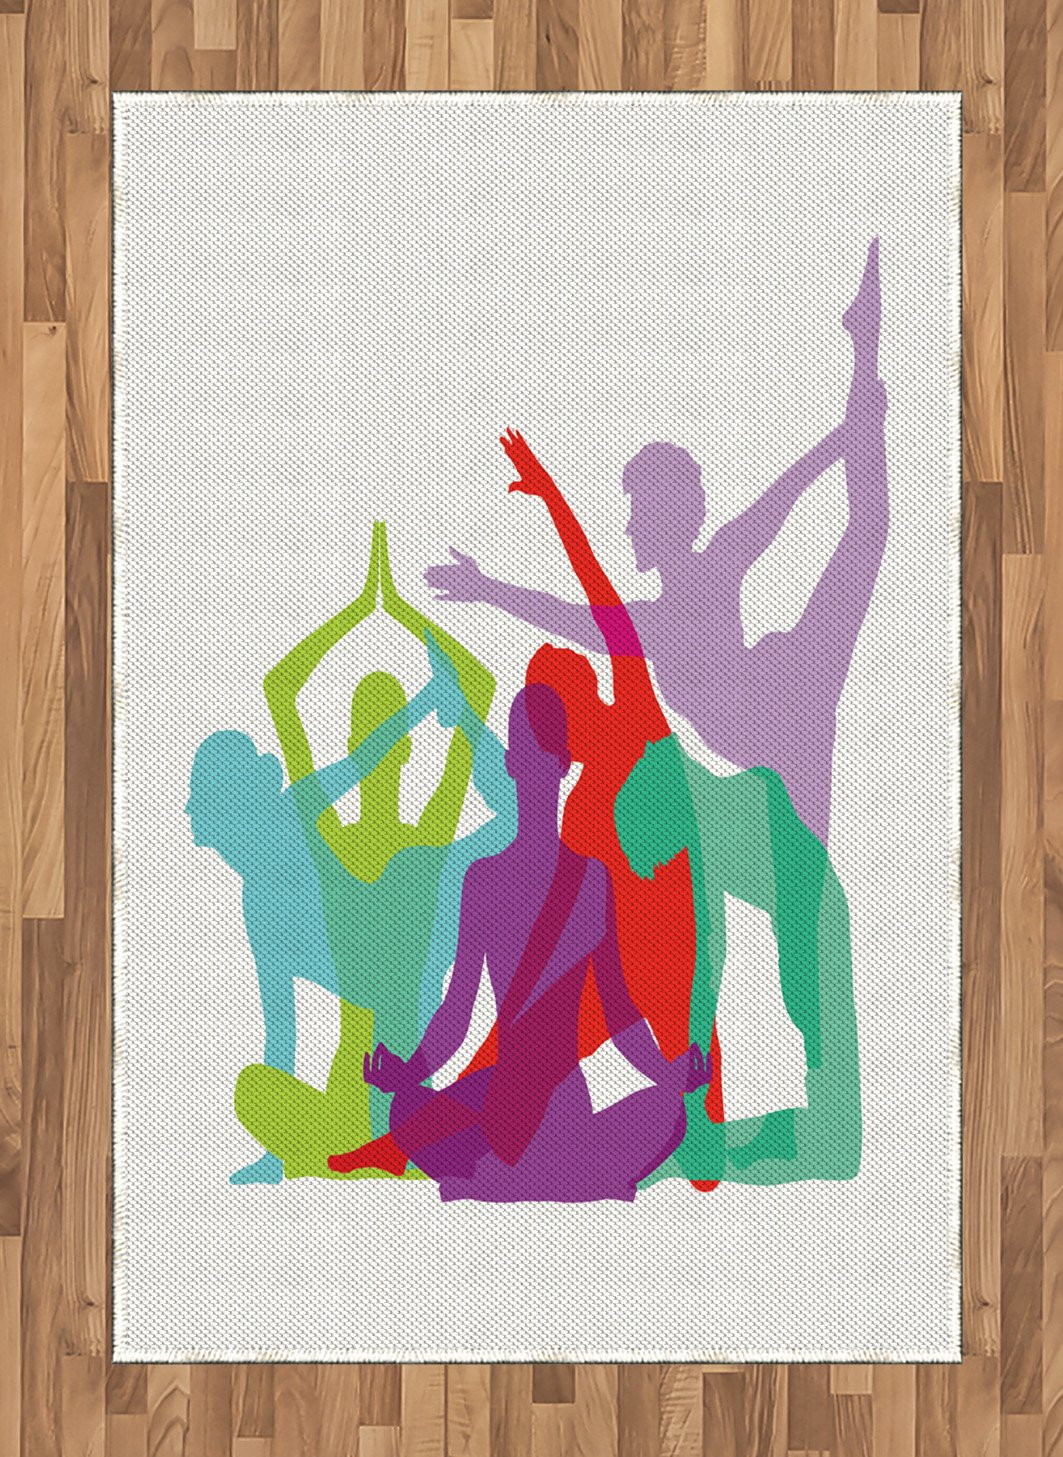 Amazon.com: Ambesonne Yoga Area Rug, Yoga Body Forms Poses ...